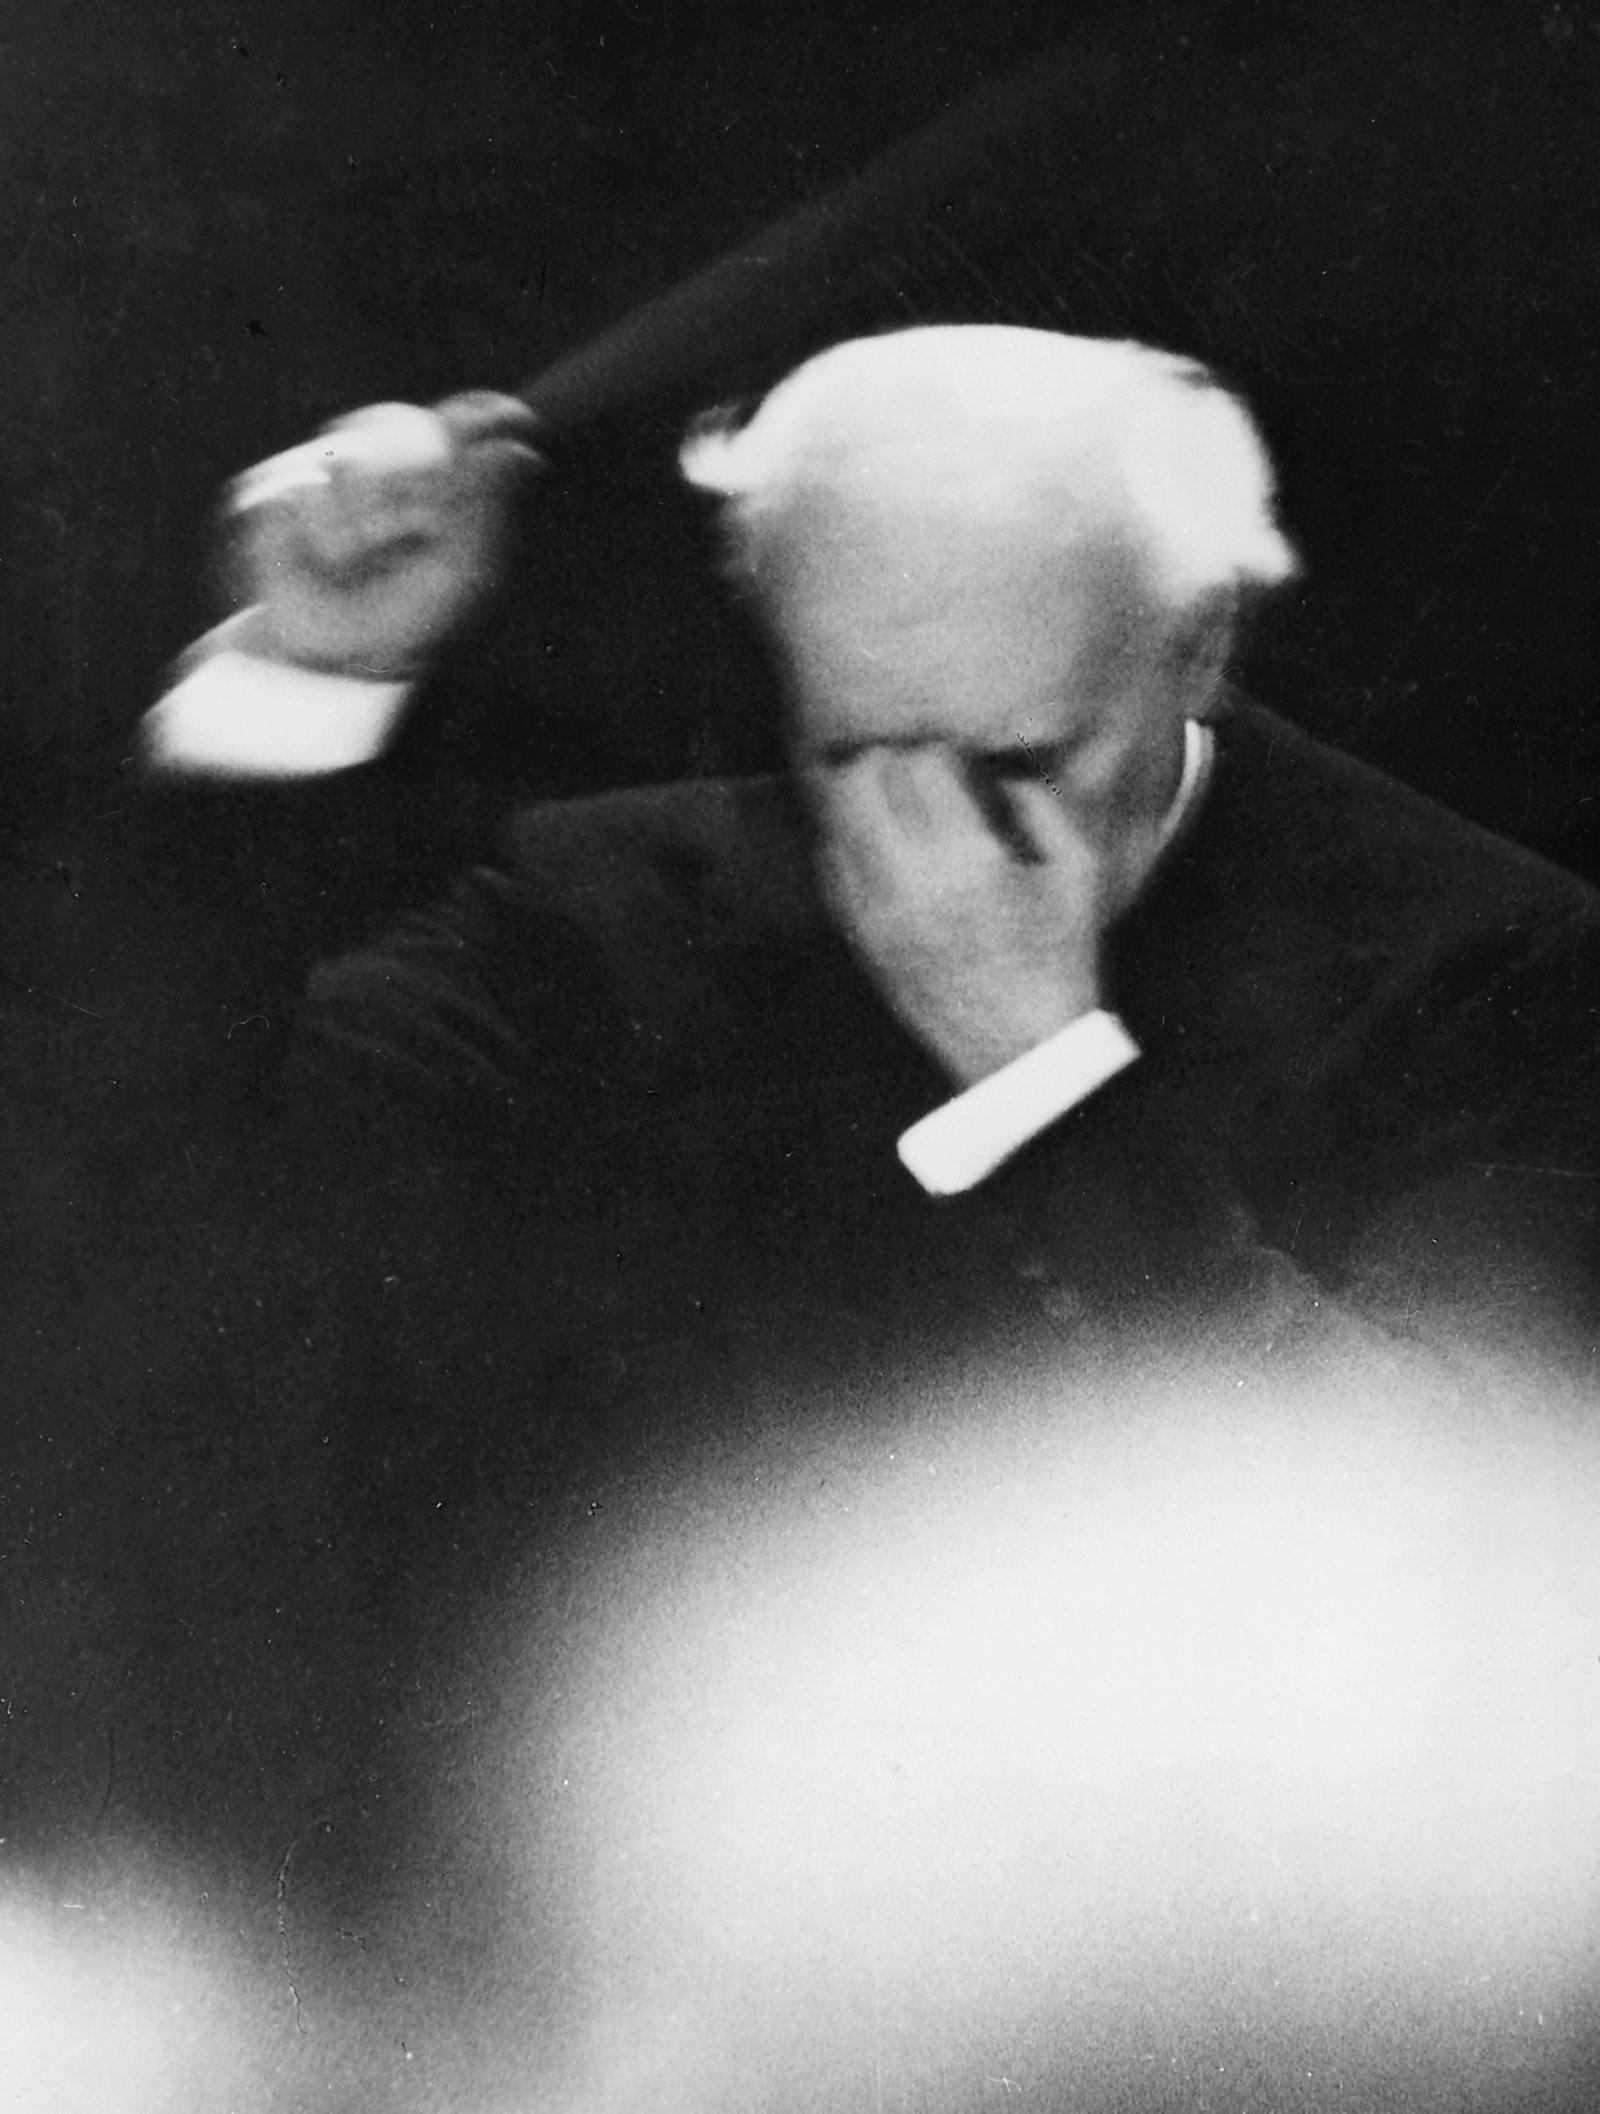 Arturo Toscanini conducting his last concert with the NBC Symphony Orchestra, April 1954